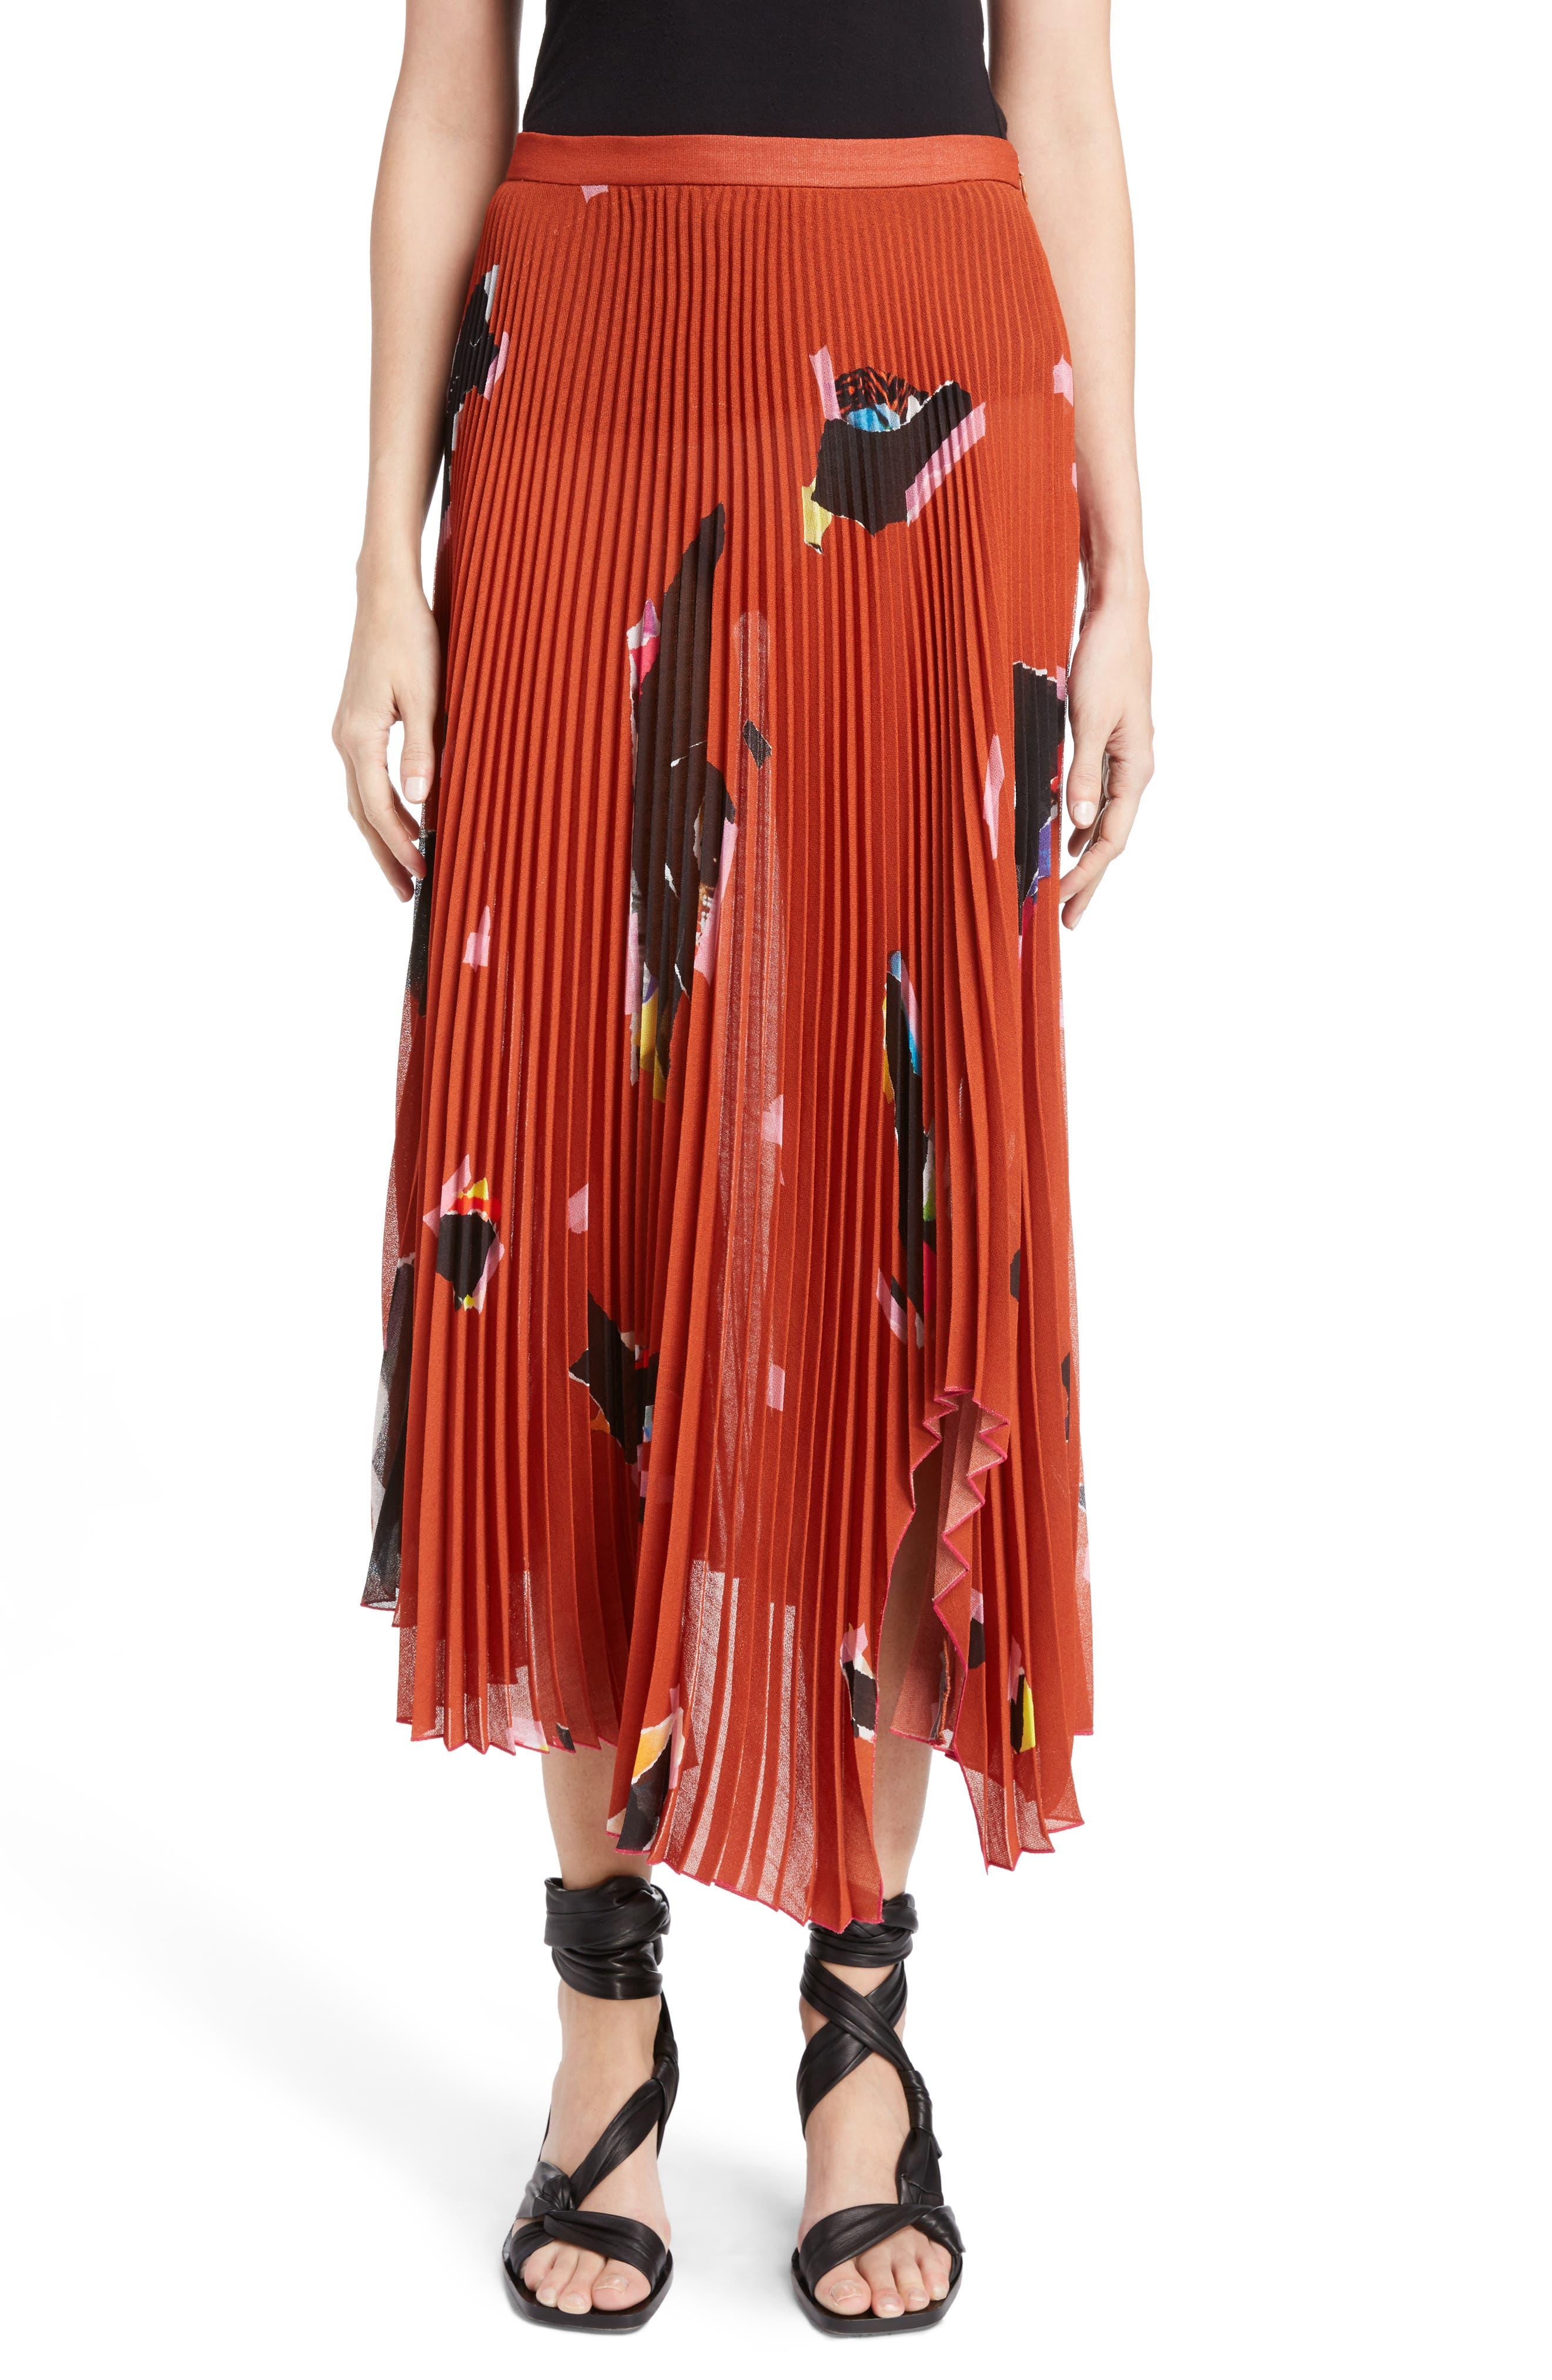 Alternate Image 1 Selected - Proenza Schouler Asymmetrical Pleated Skirt